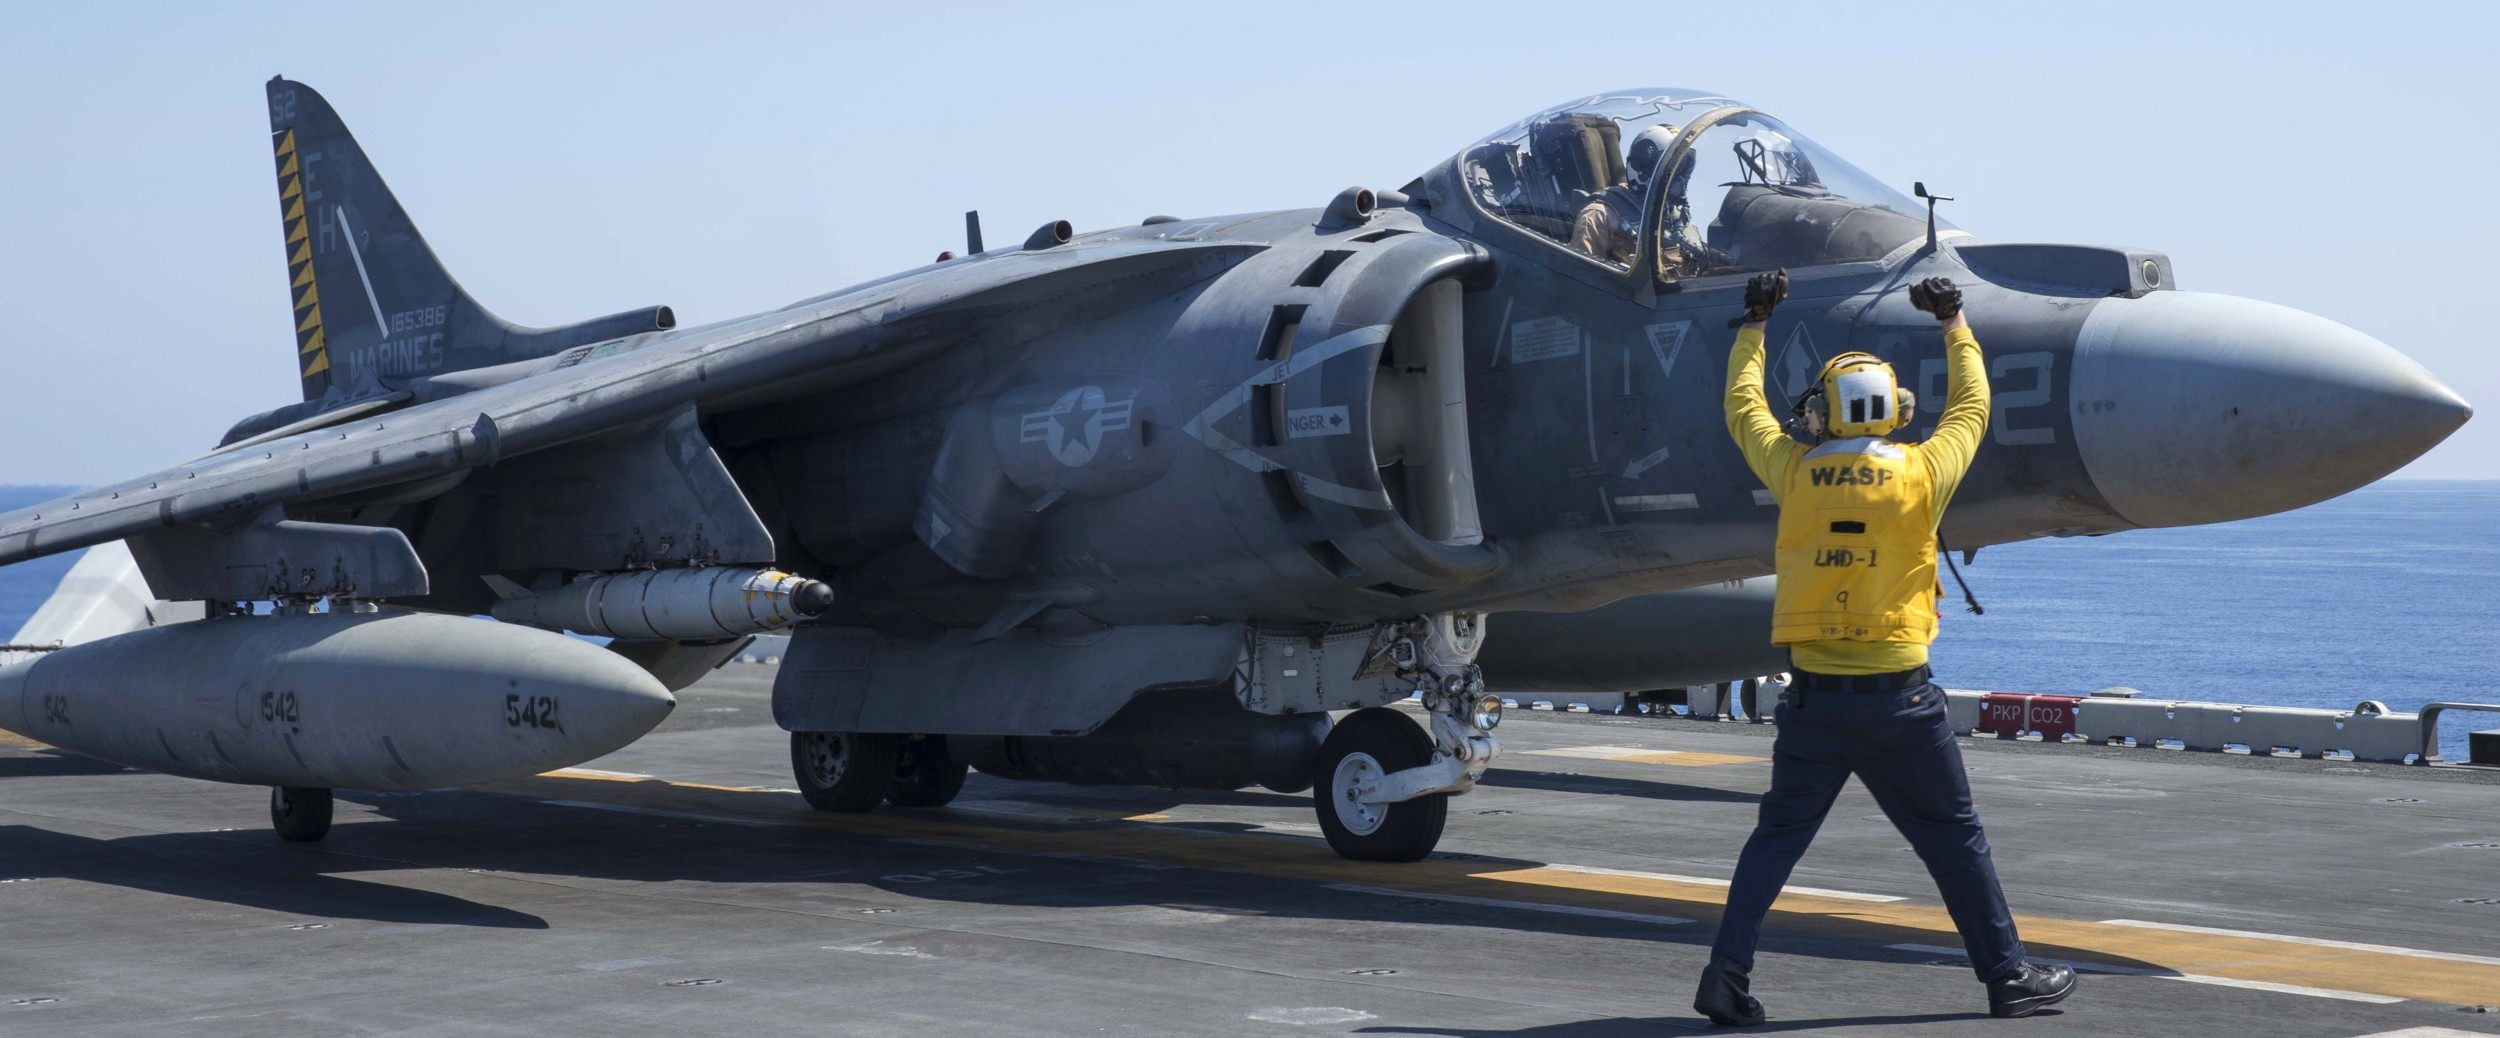 vma-542 tigers av-8b harrier us marine corps attack squadron 2016 128